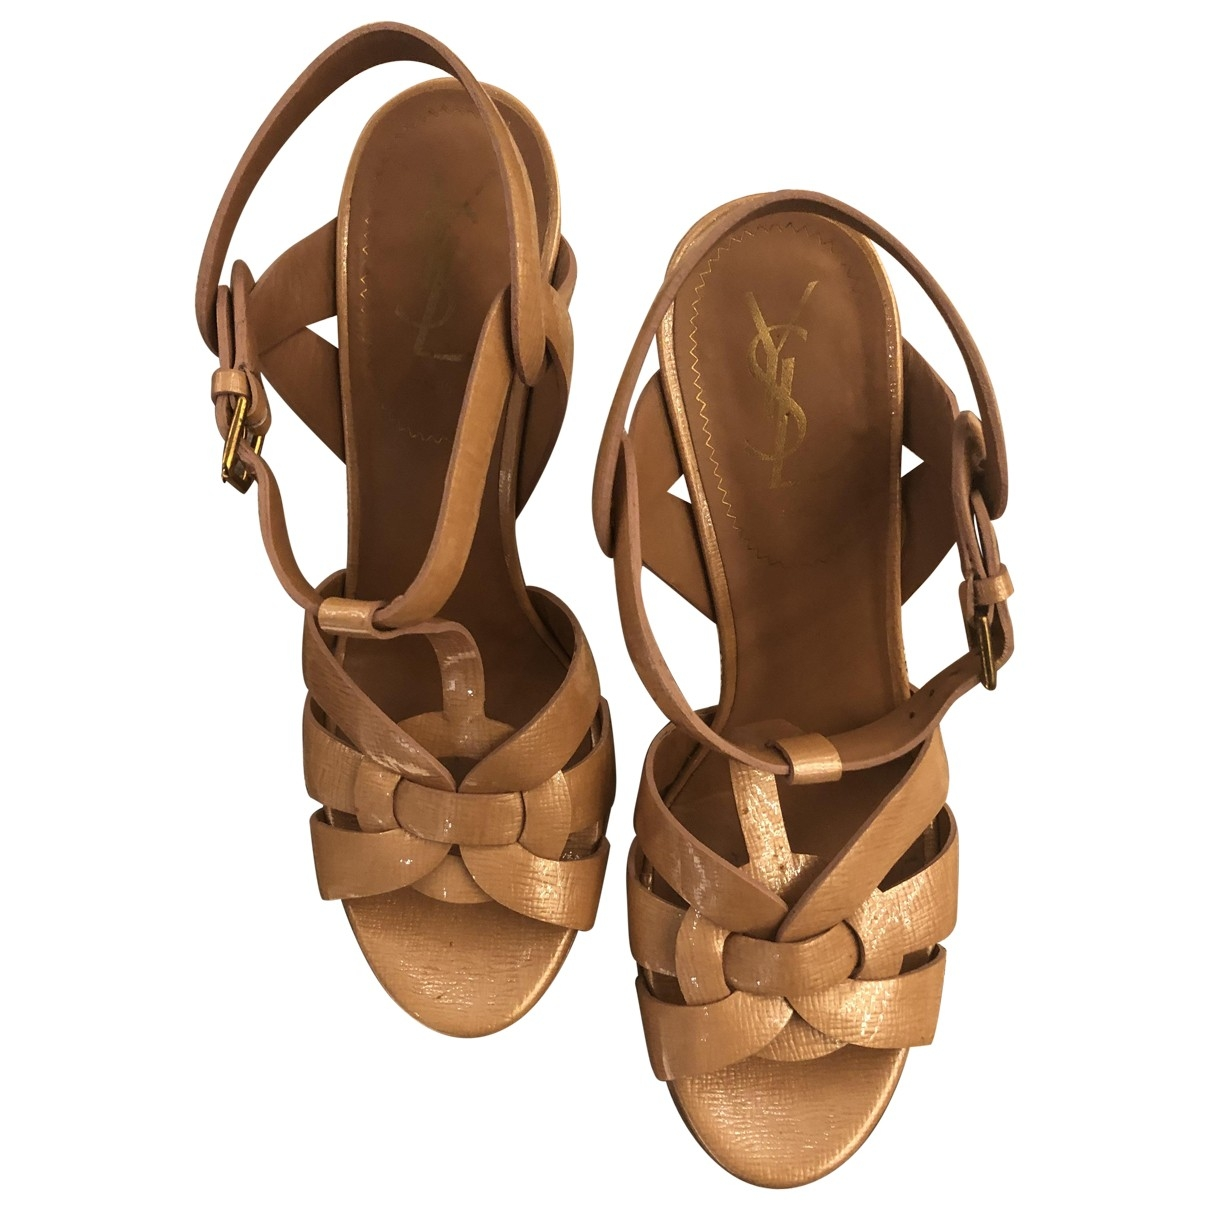 Yves Saint Laurent Tribute Pink Patent leather Sandals for Women 38.5 EU